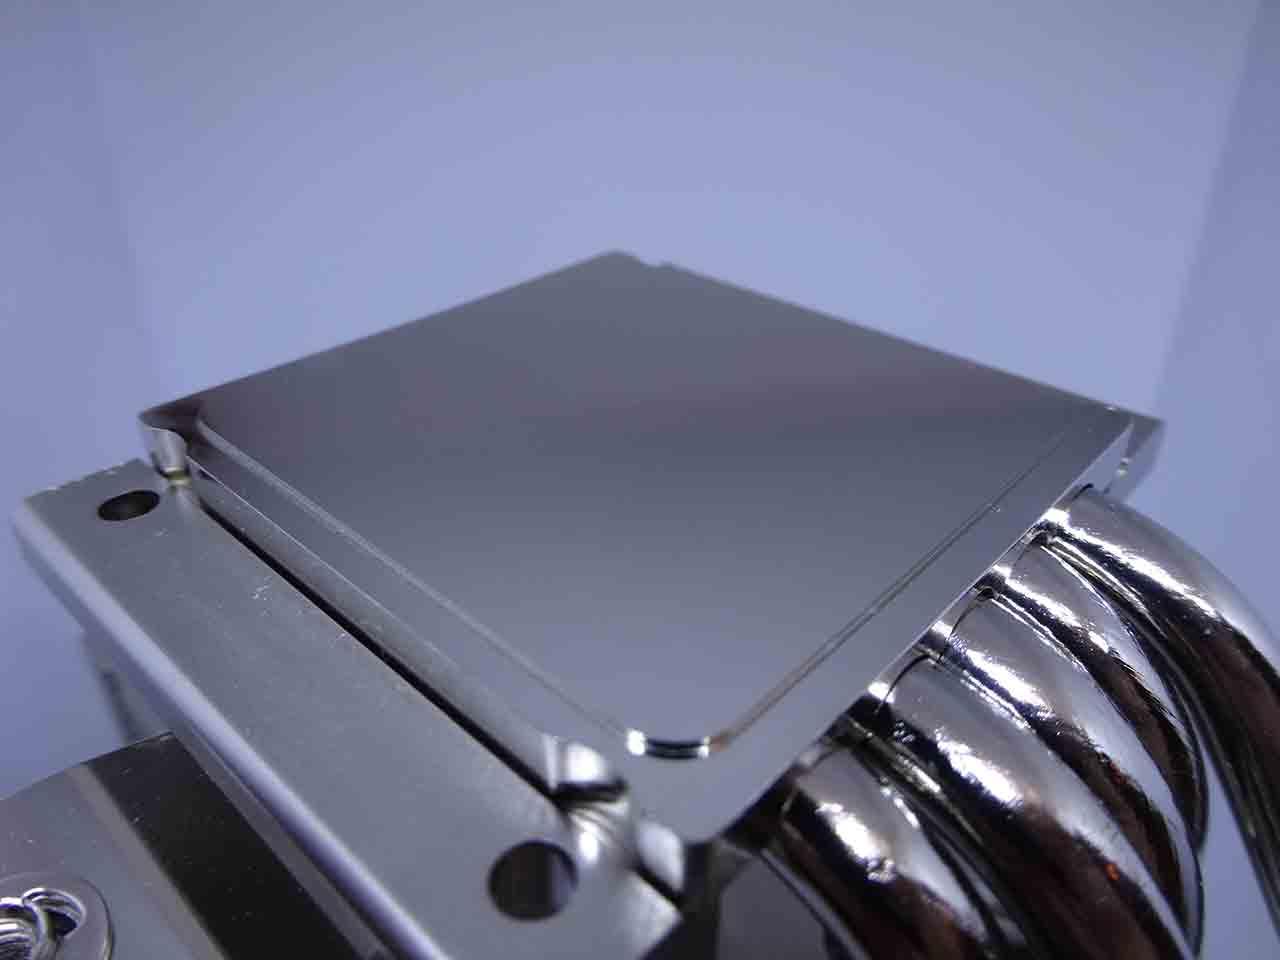 Обзор и тестирование кулера Noctua NH-U12S